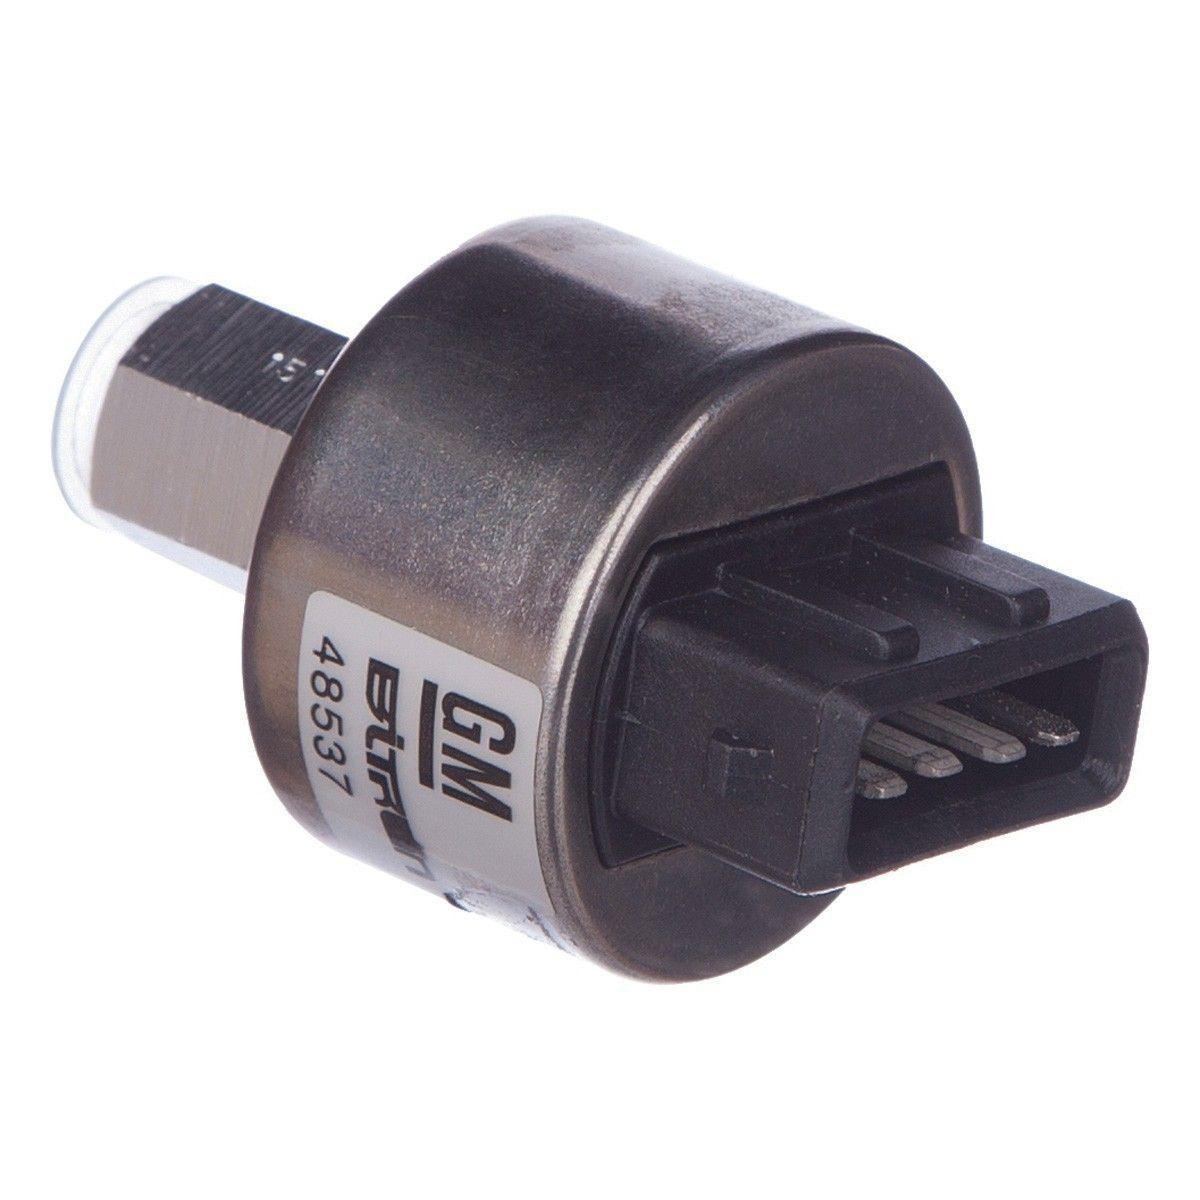 Interruptor pressostato ar condicionado - Astra de 1995 a 1996